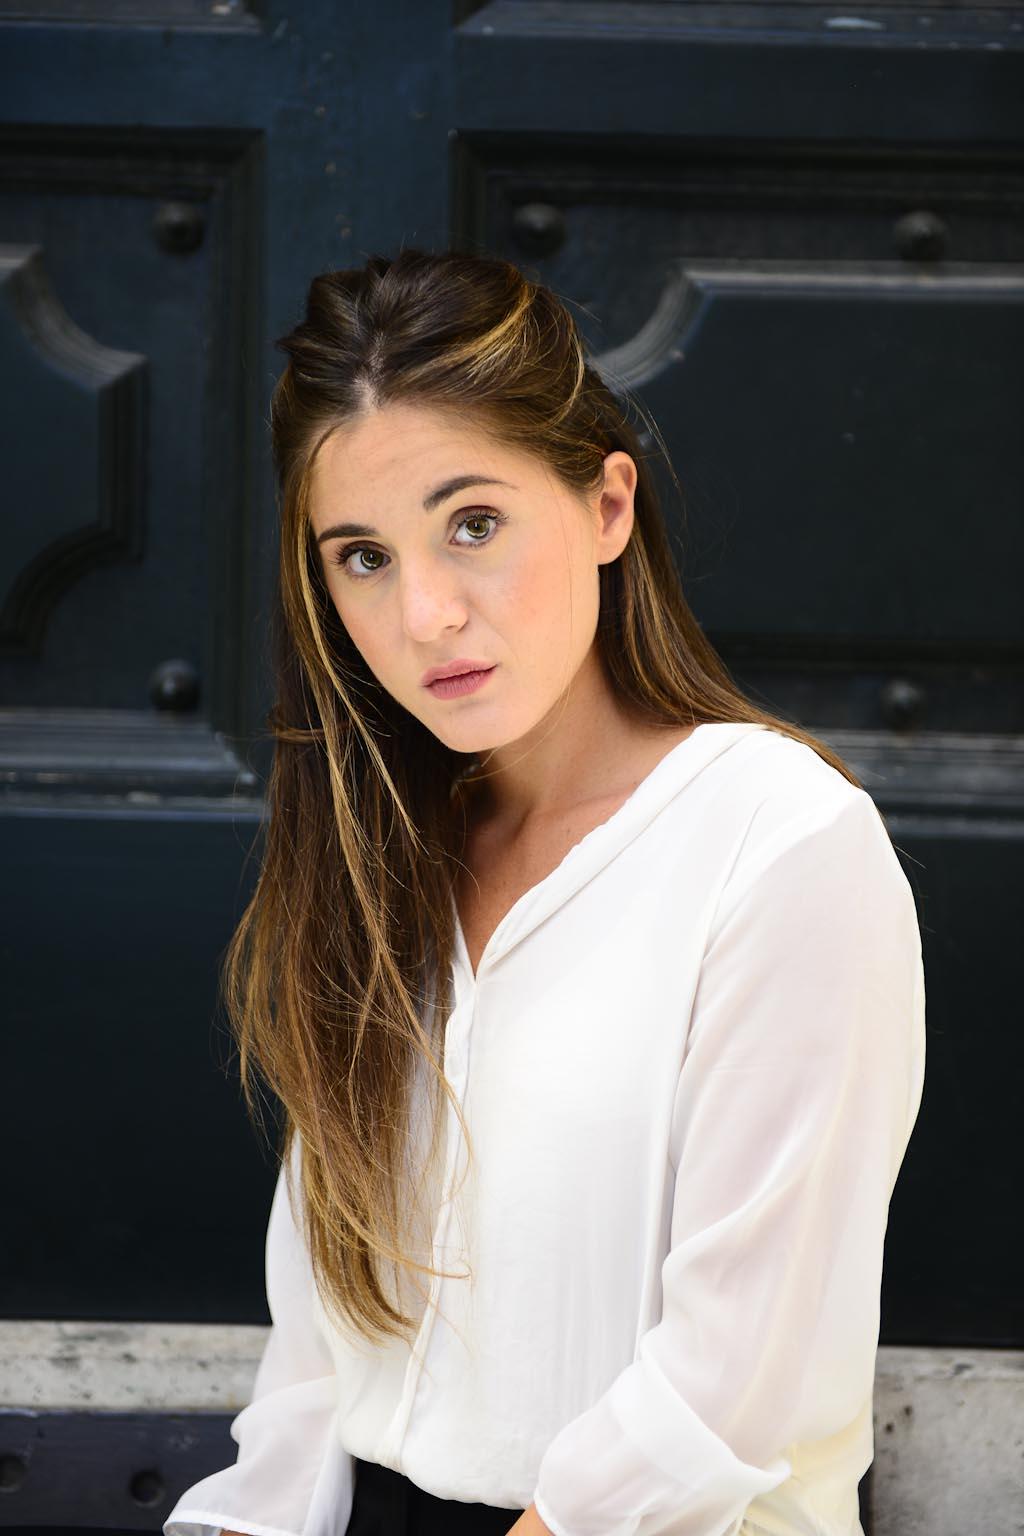 Marianna Robustelli